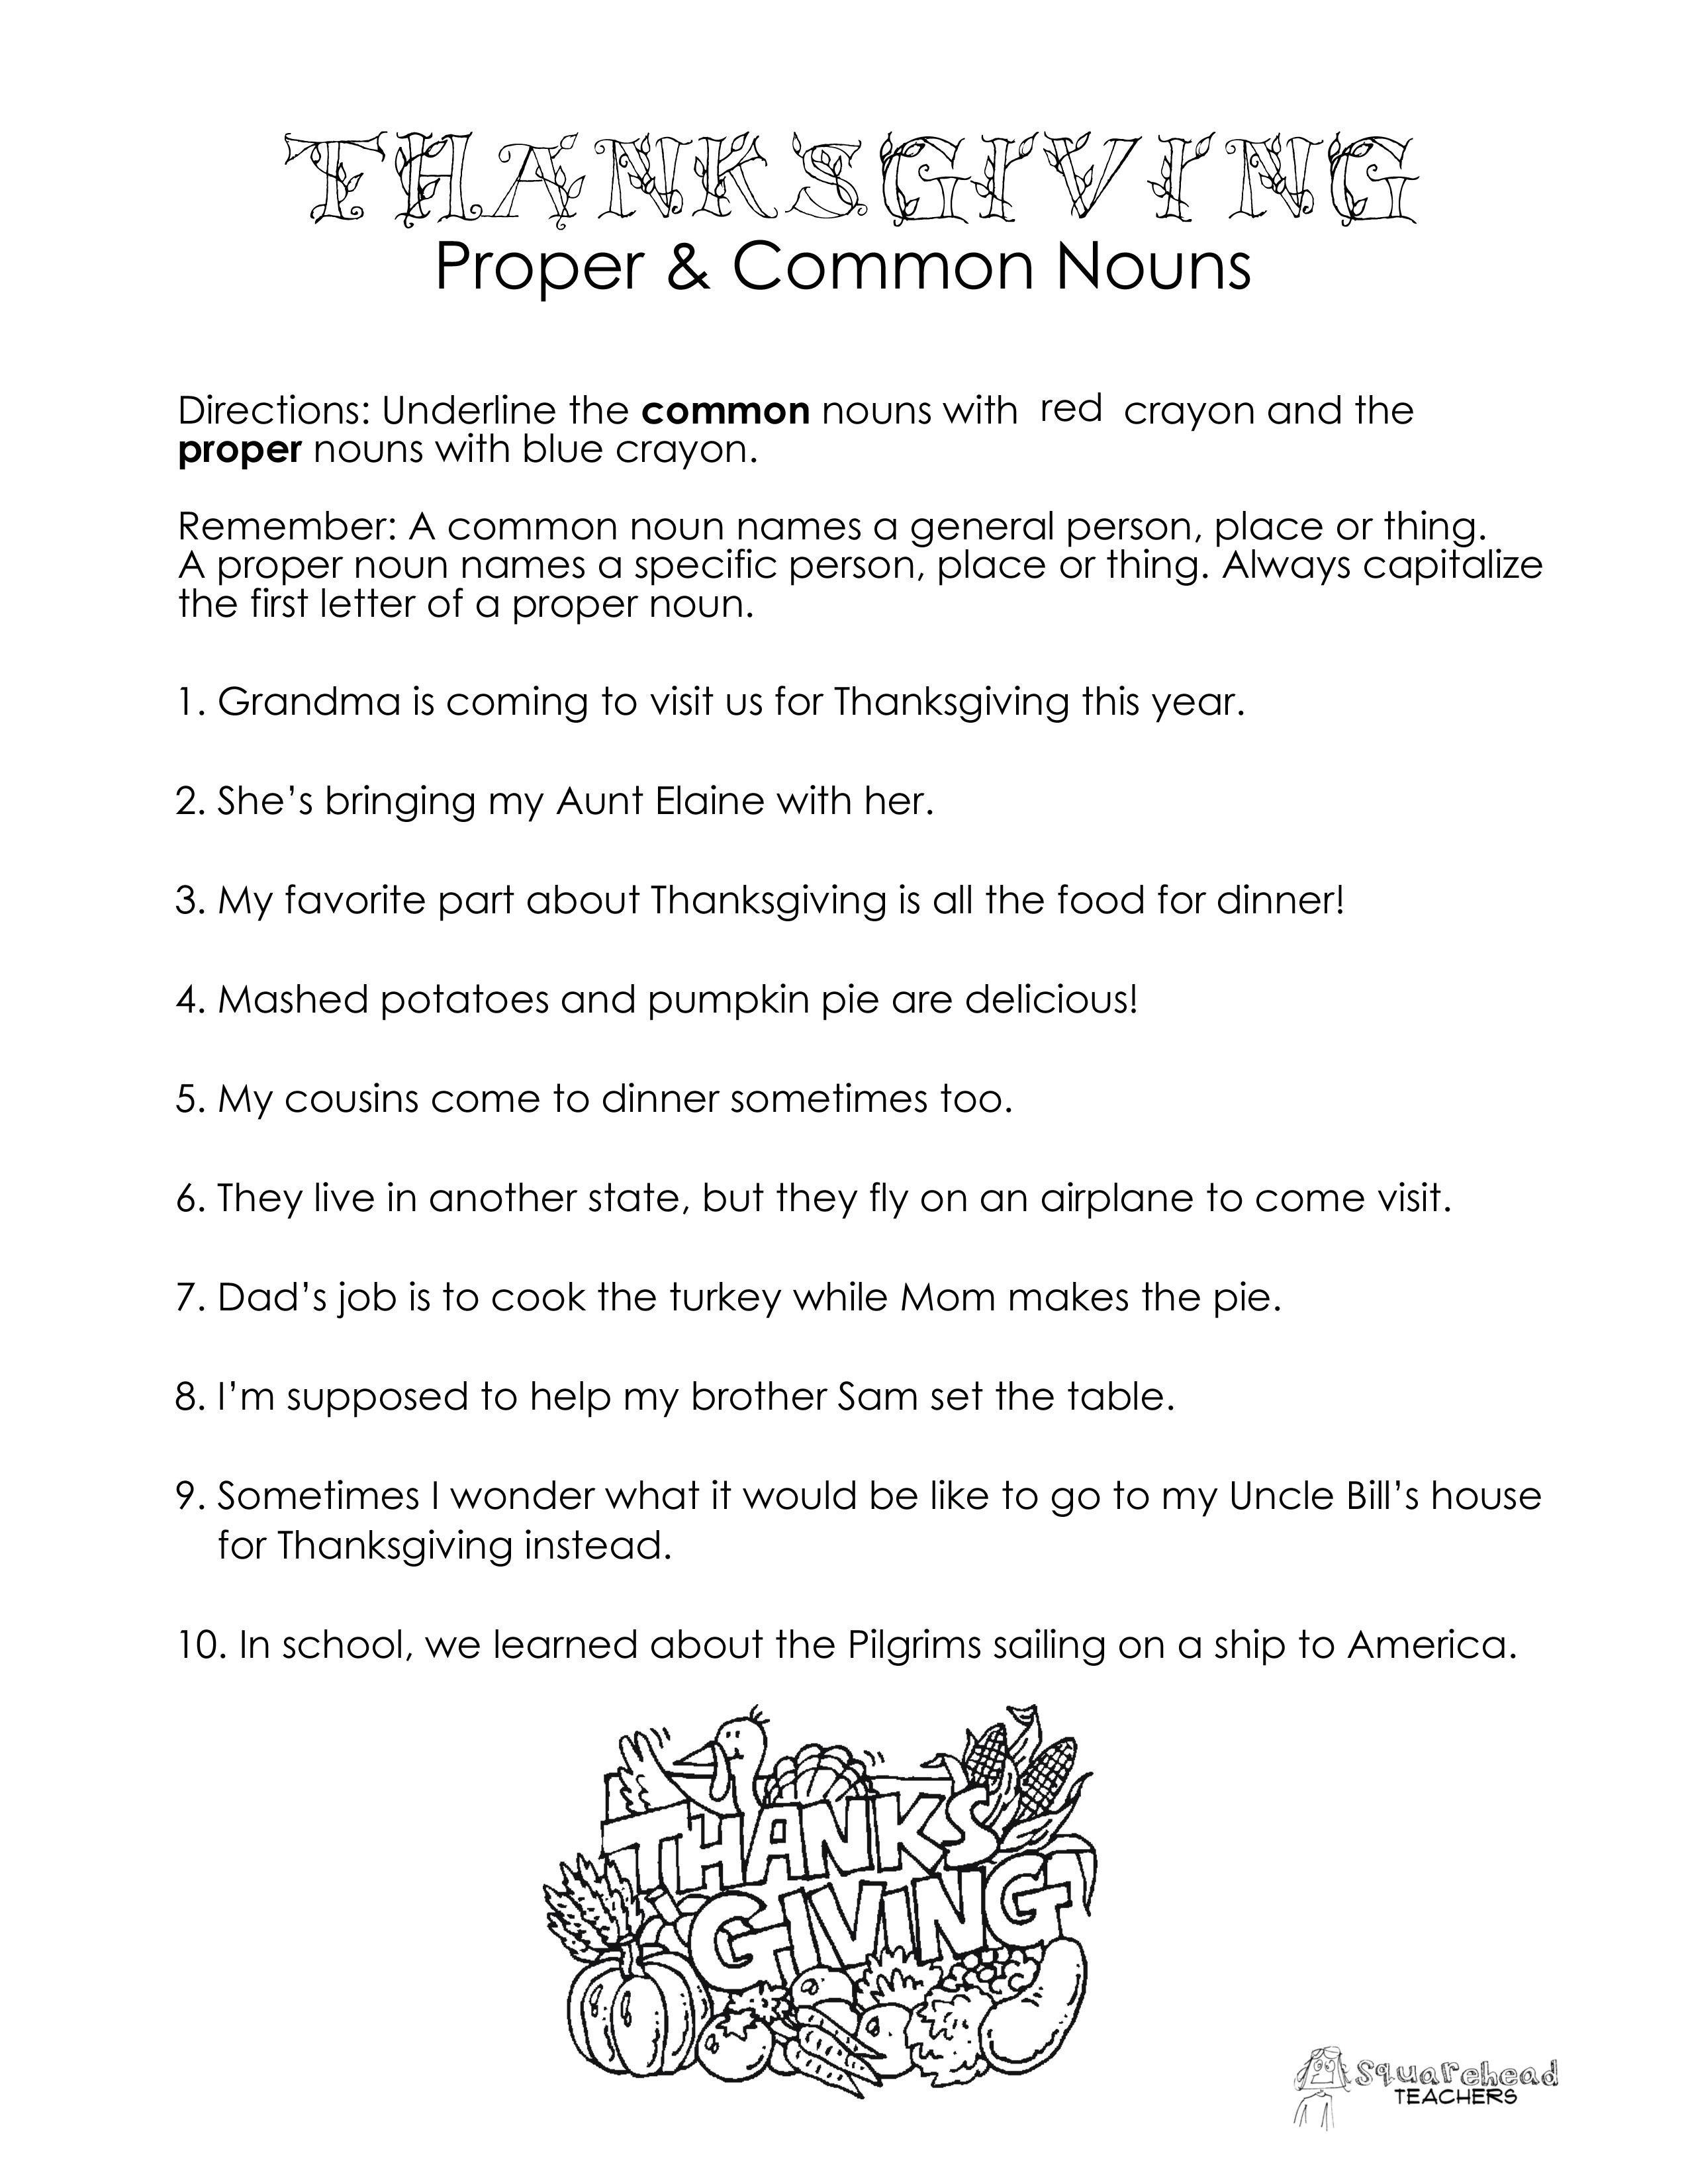 Thanksgiving Common Vs. Proper Nouns Worksheet   Squarehead Teachers   Free Printable Thanksgiving Worksheets For Middle School